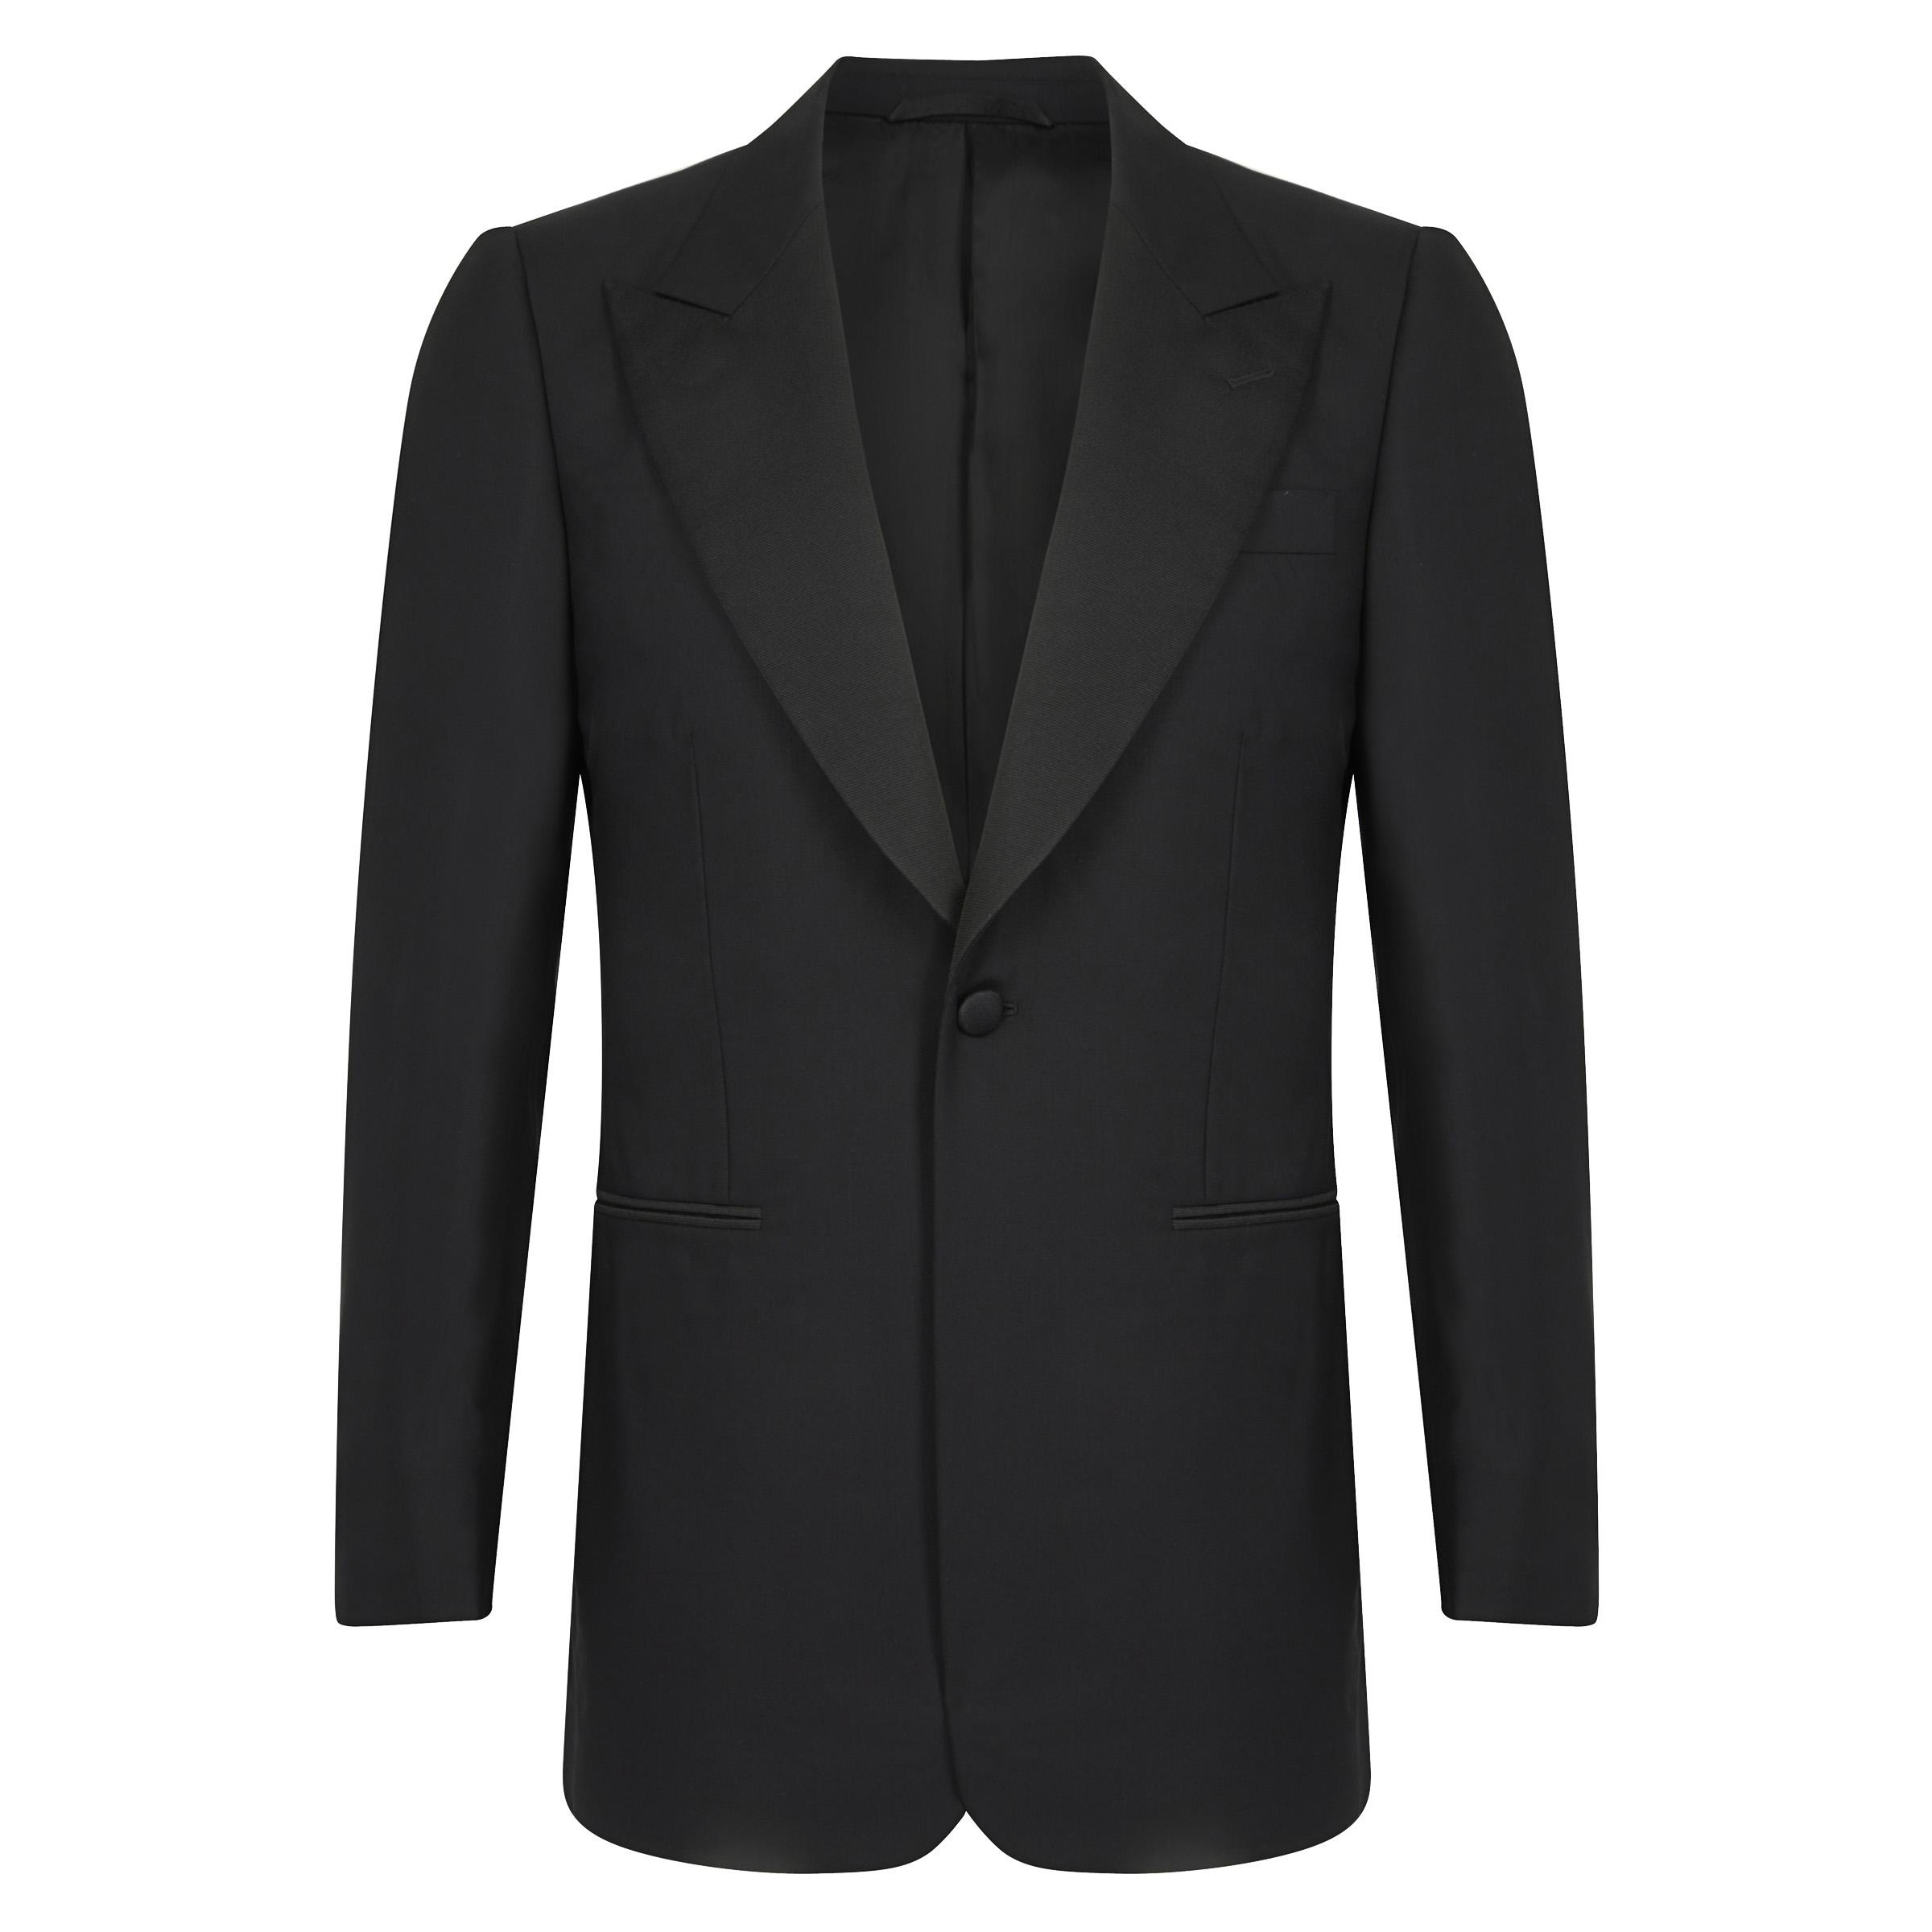 Black Wool Single-Breasted Dinner Jacket